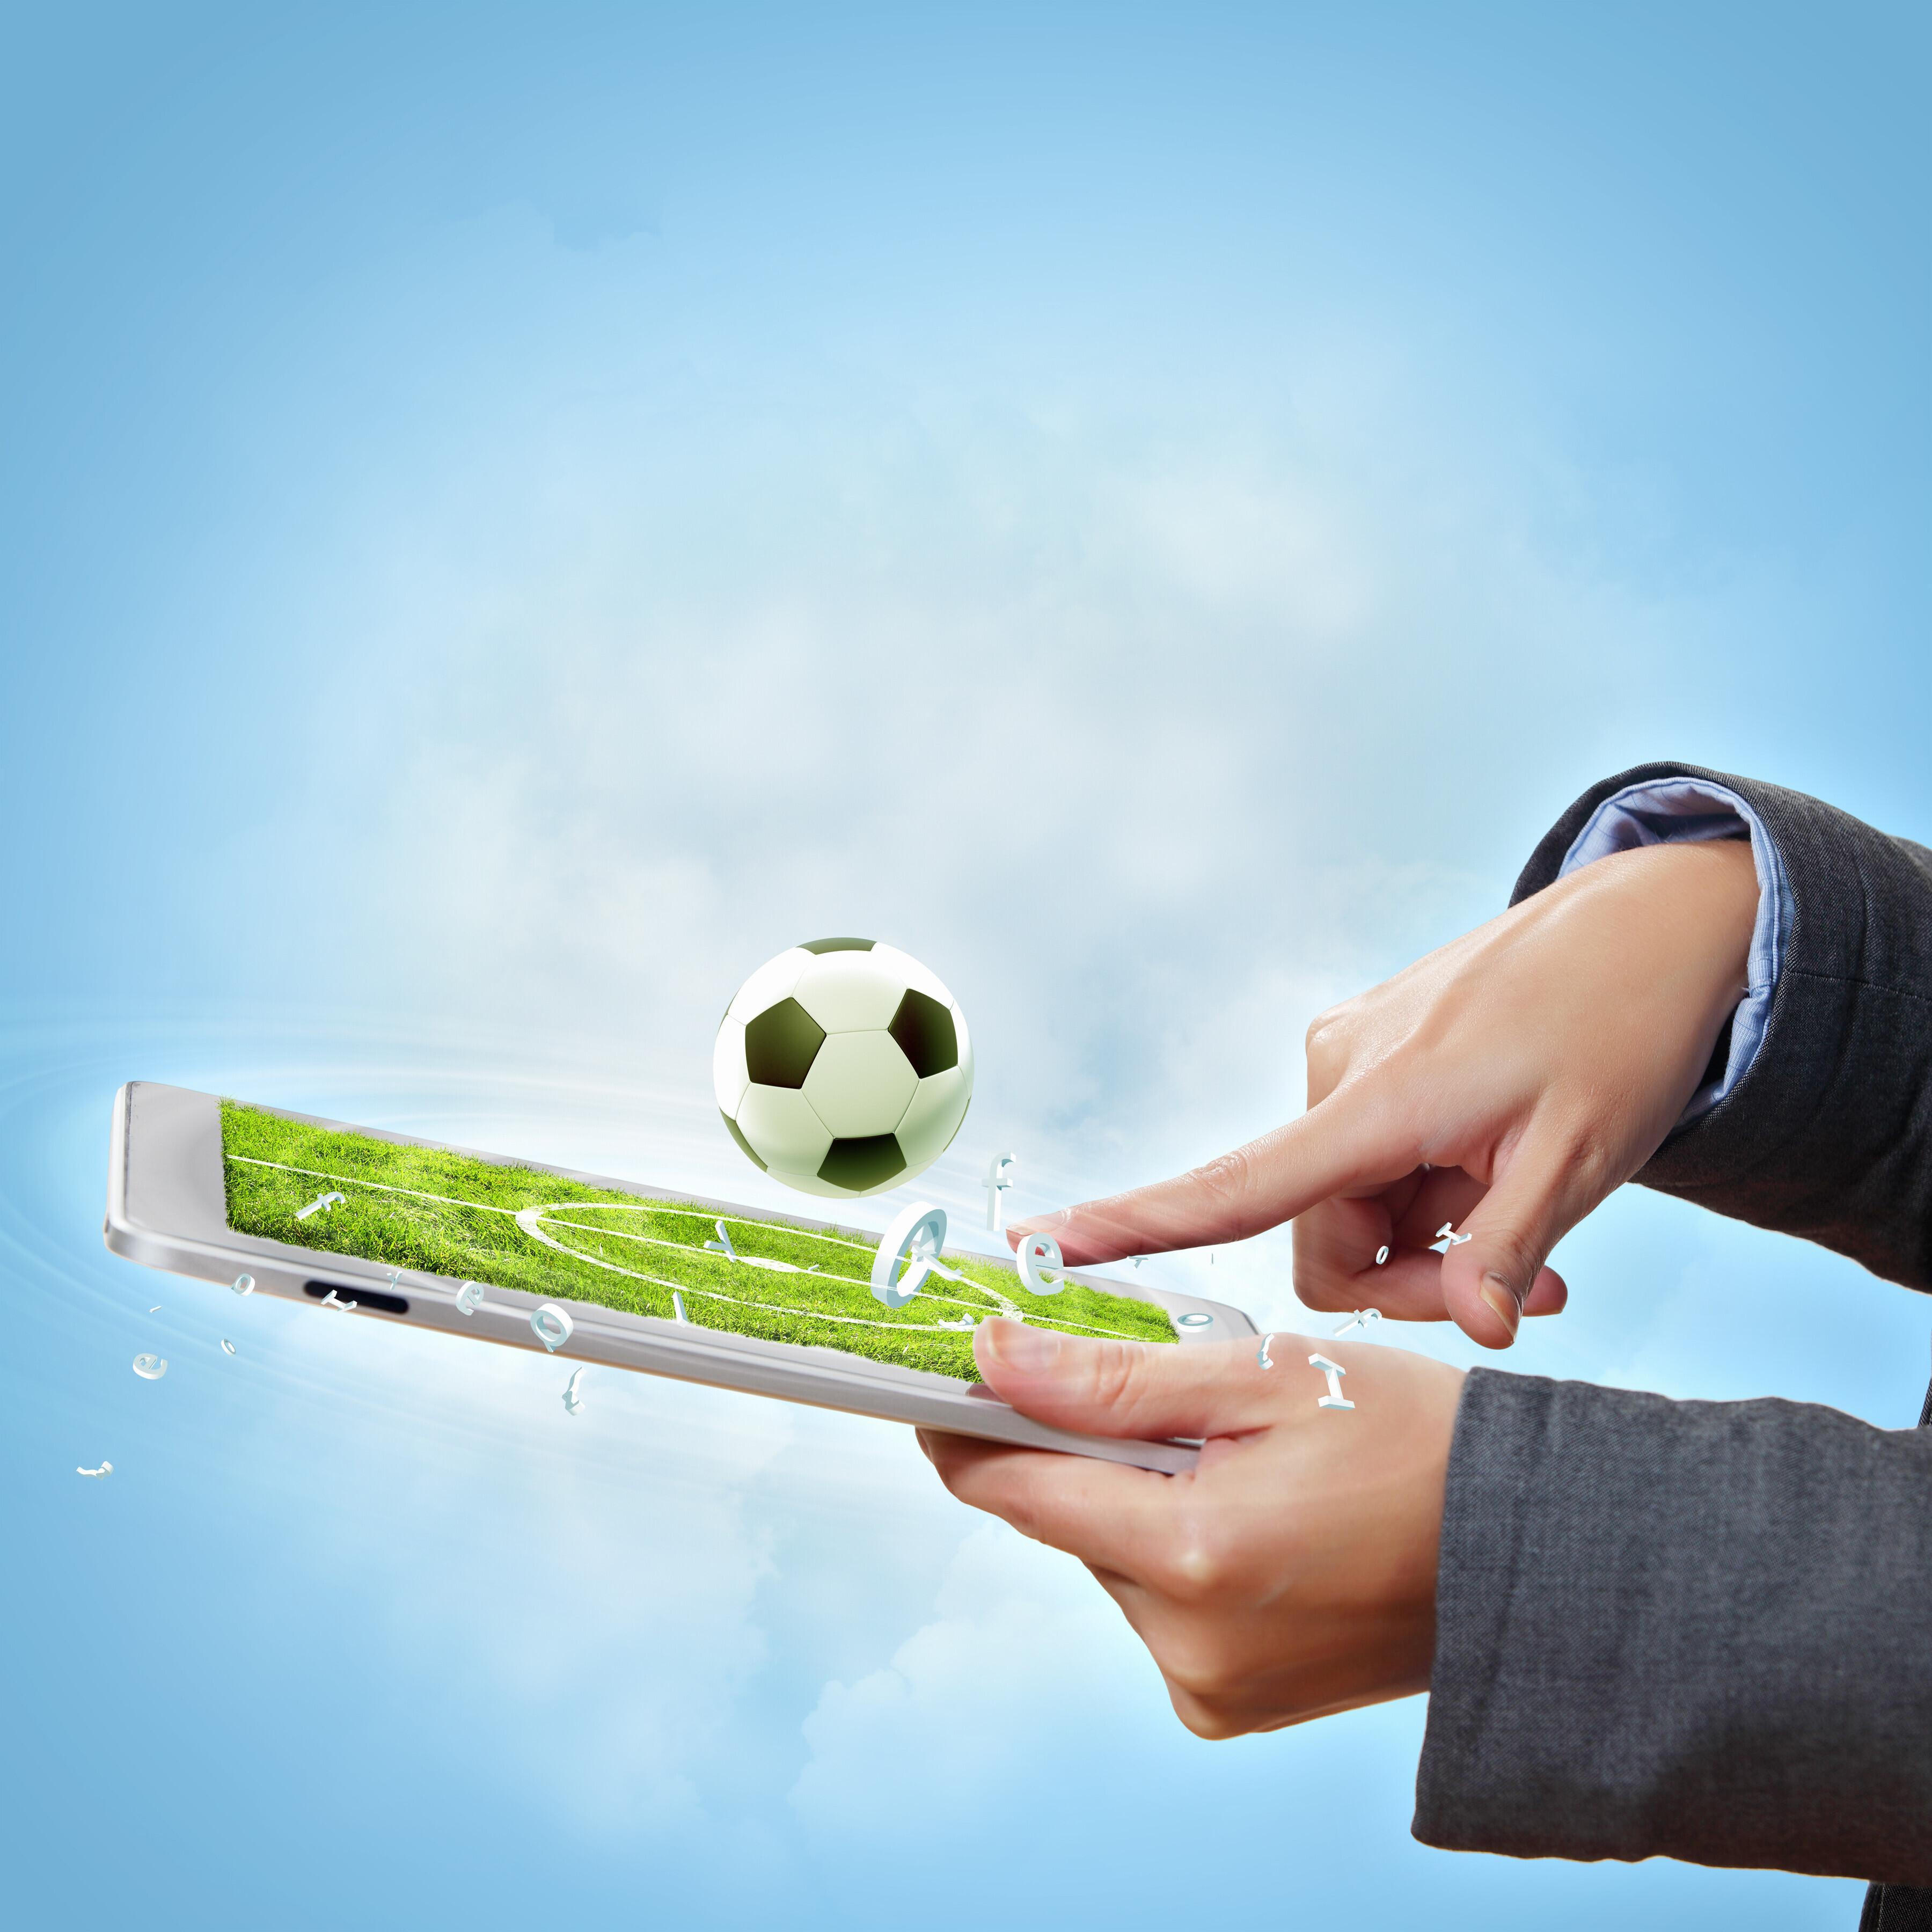 Mortgage application gambling transactions dr casino